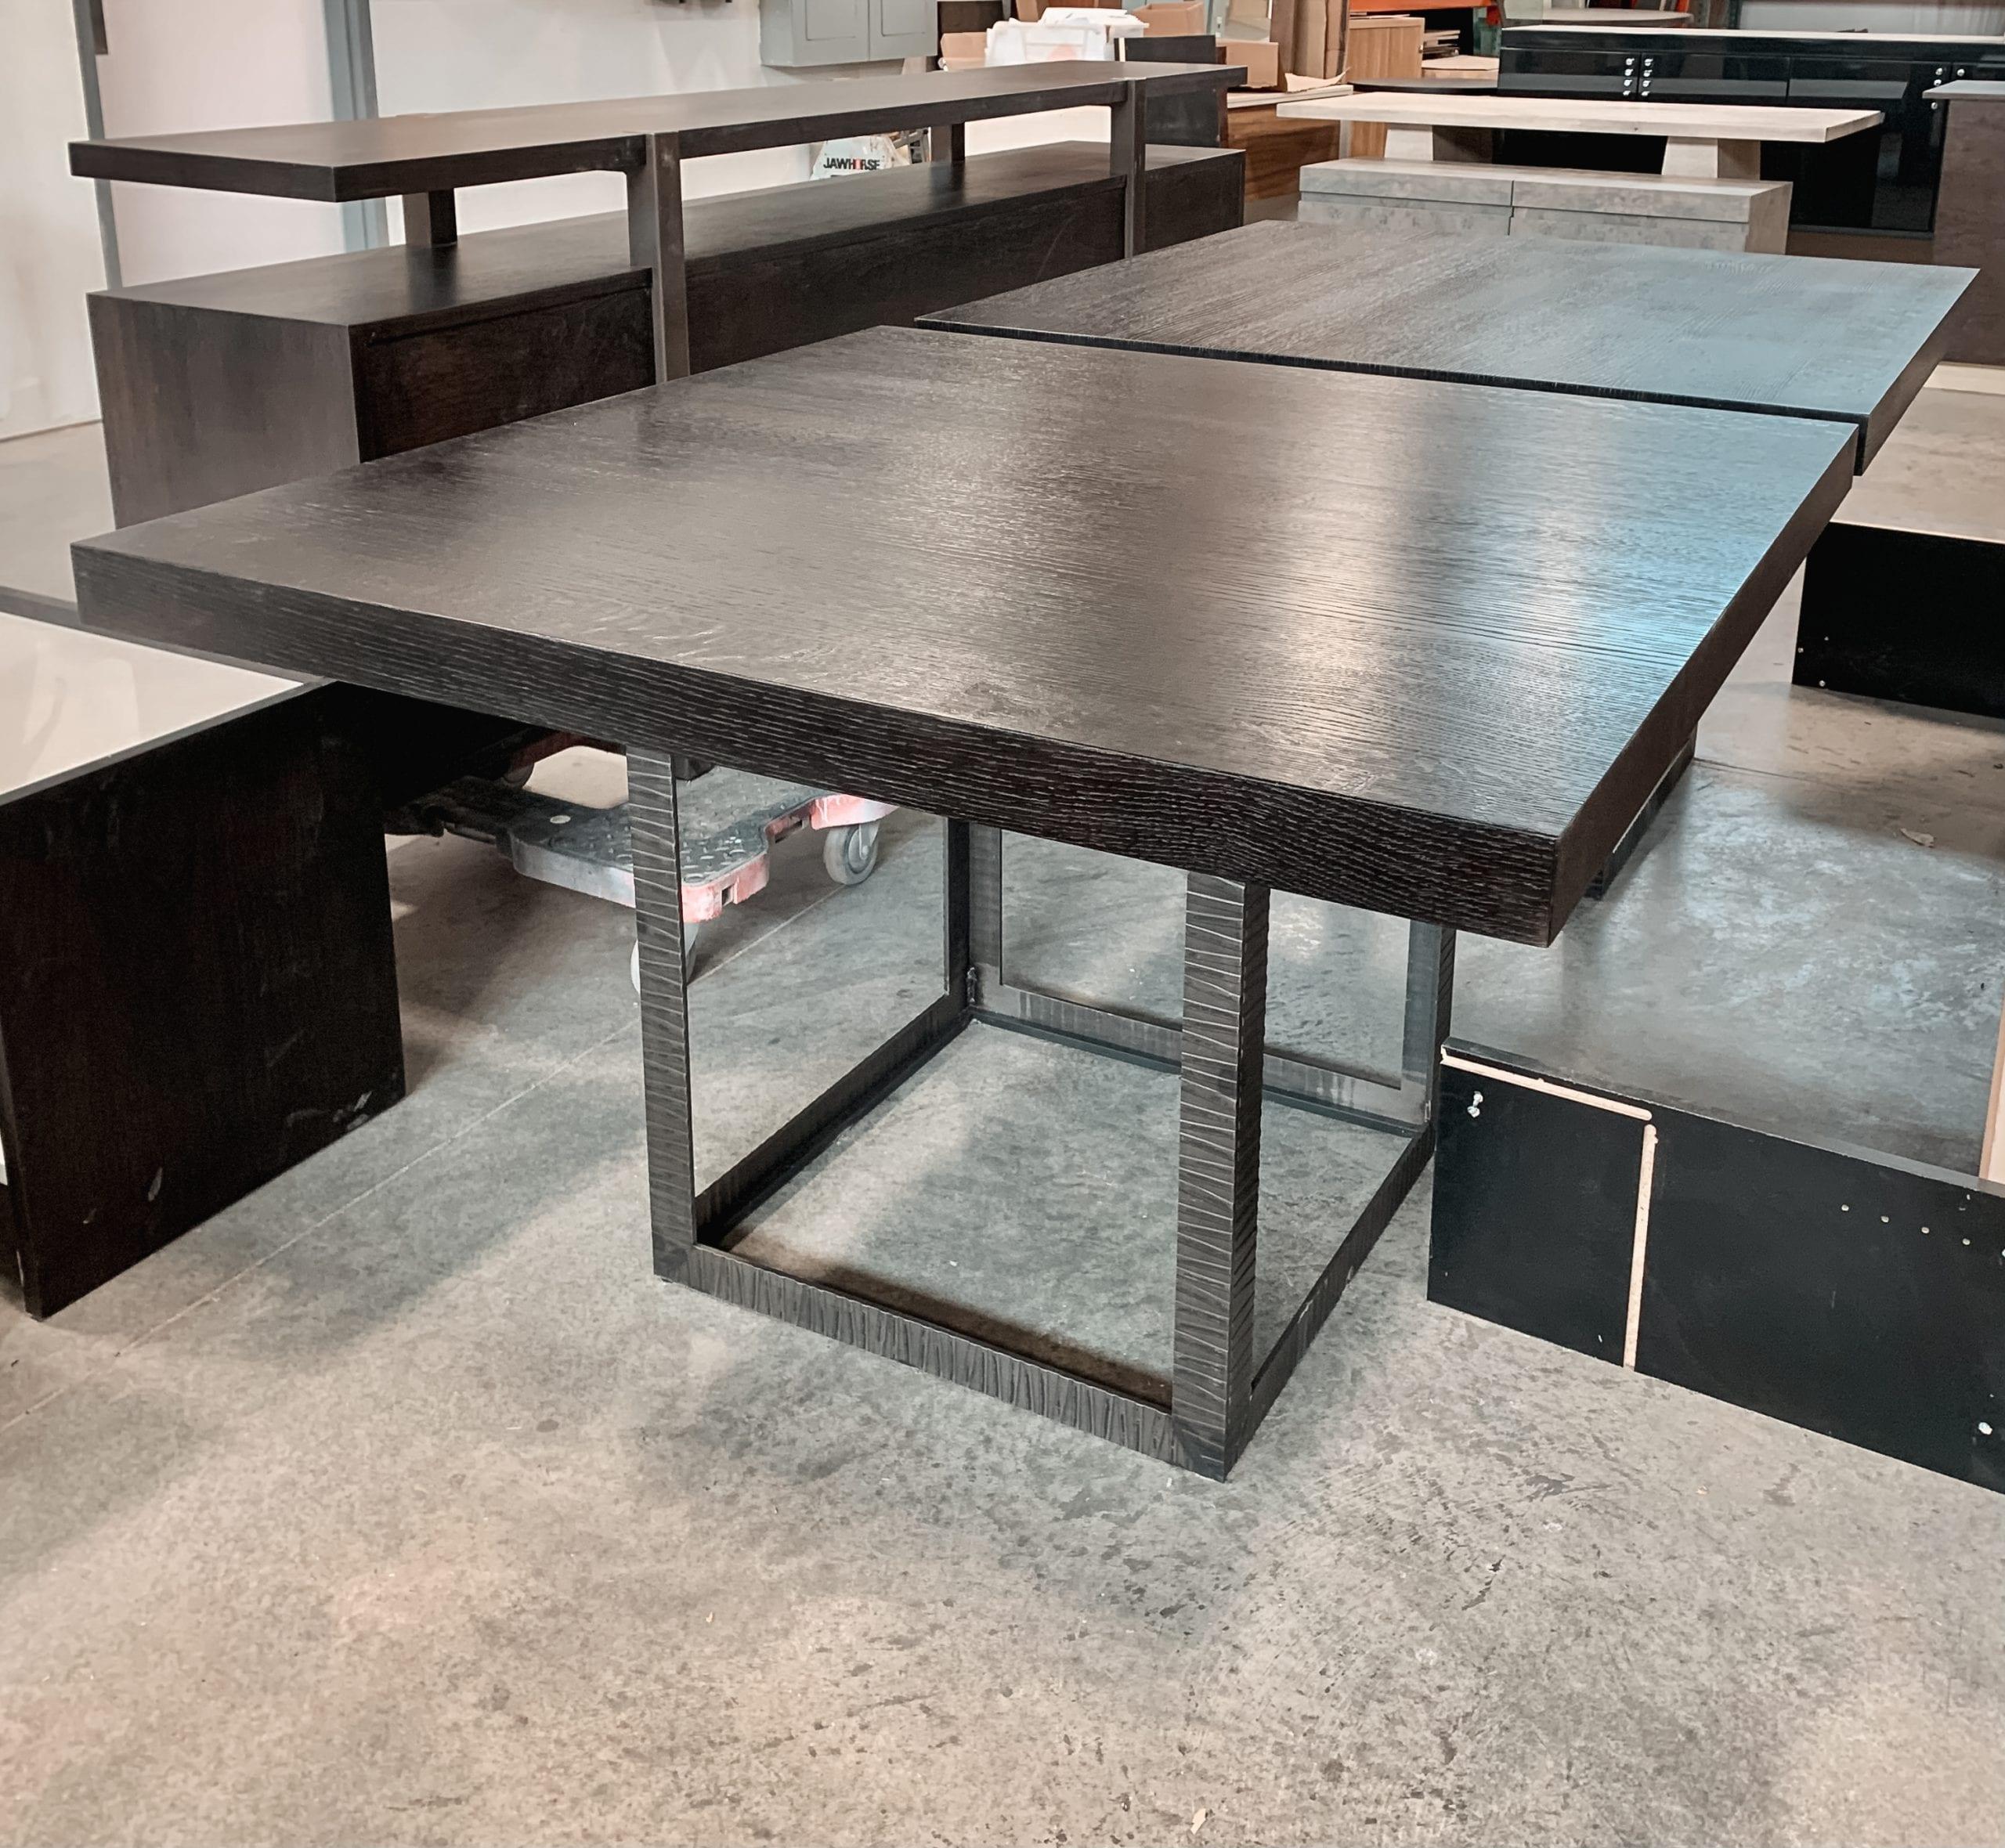 Textured, ebonized oak and iron tables